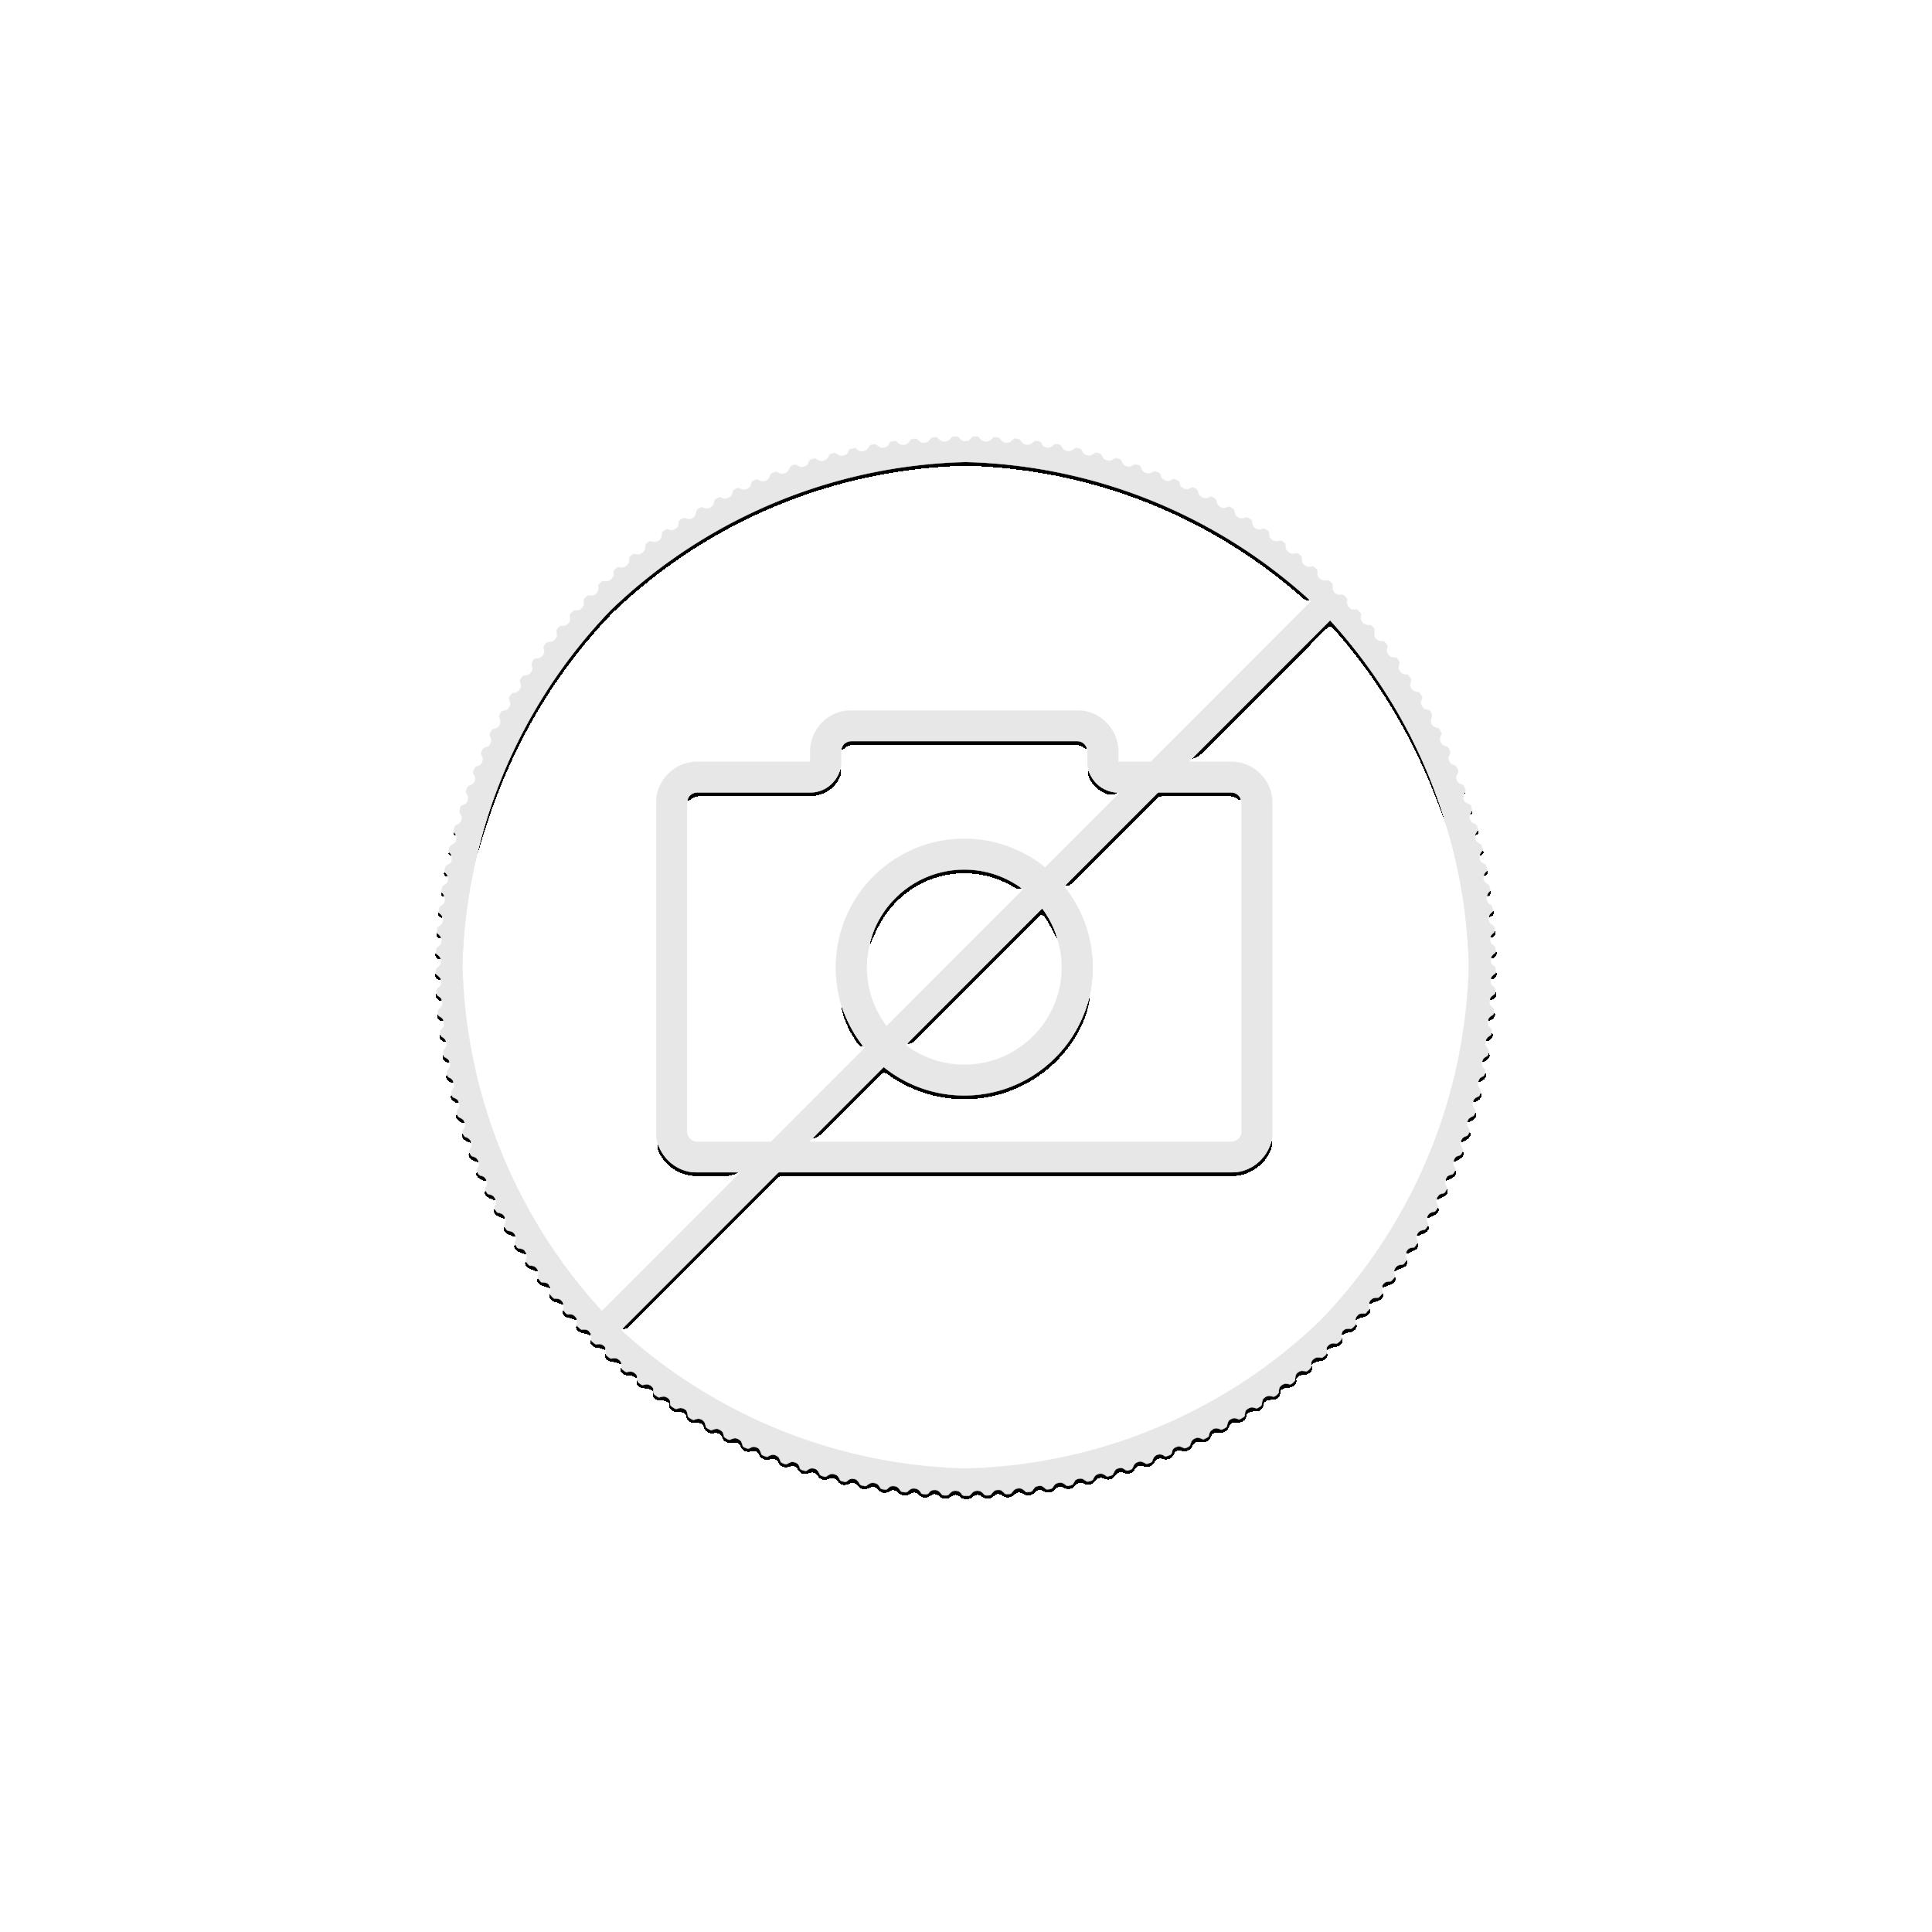 10 Gram gold bar Pamp Suisse - Lady Fortuna